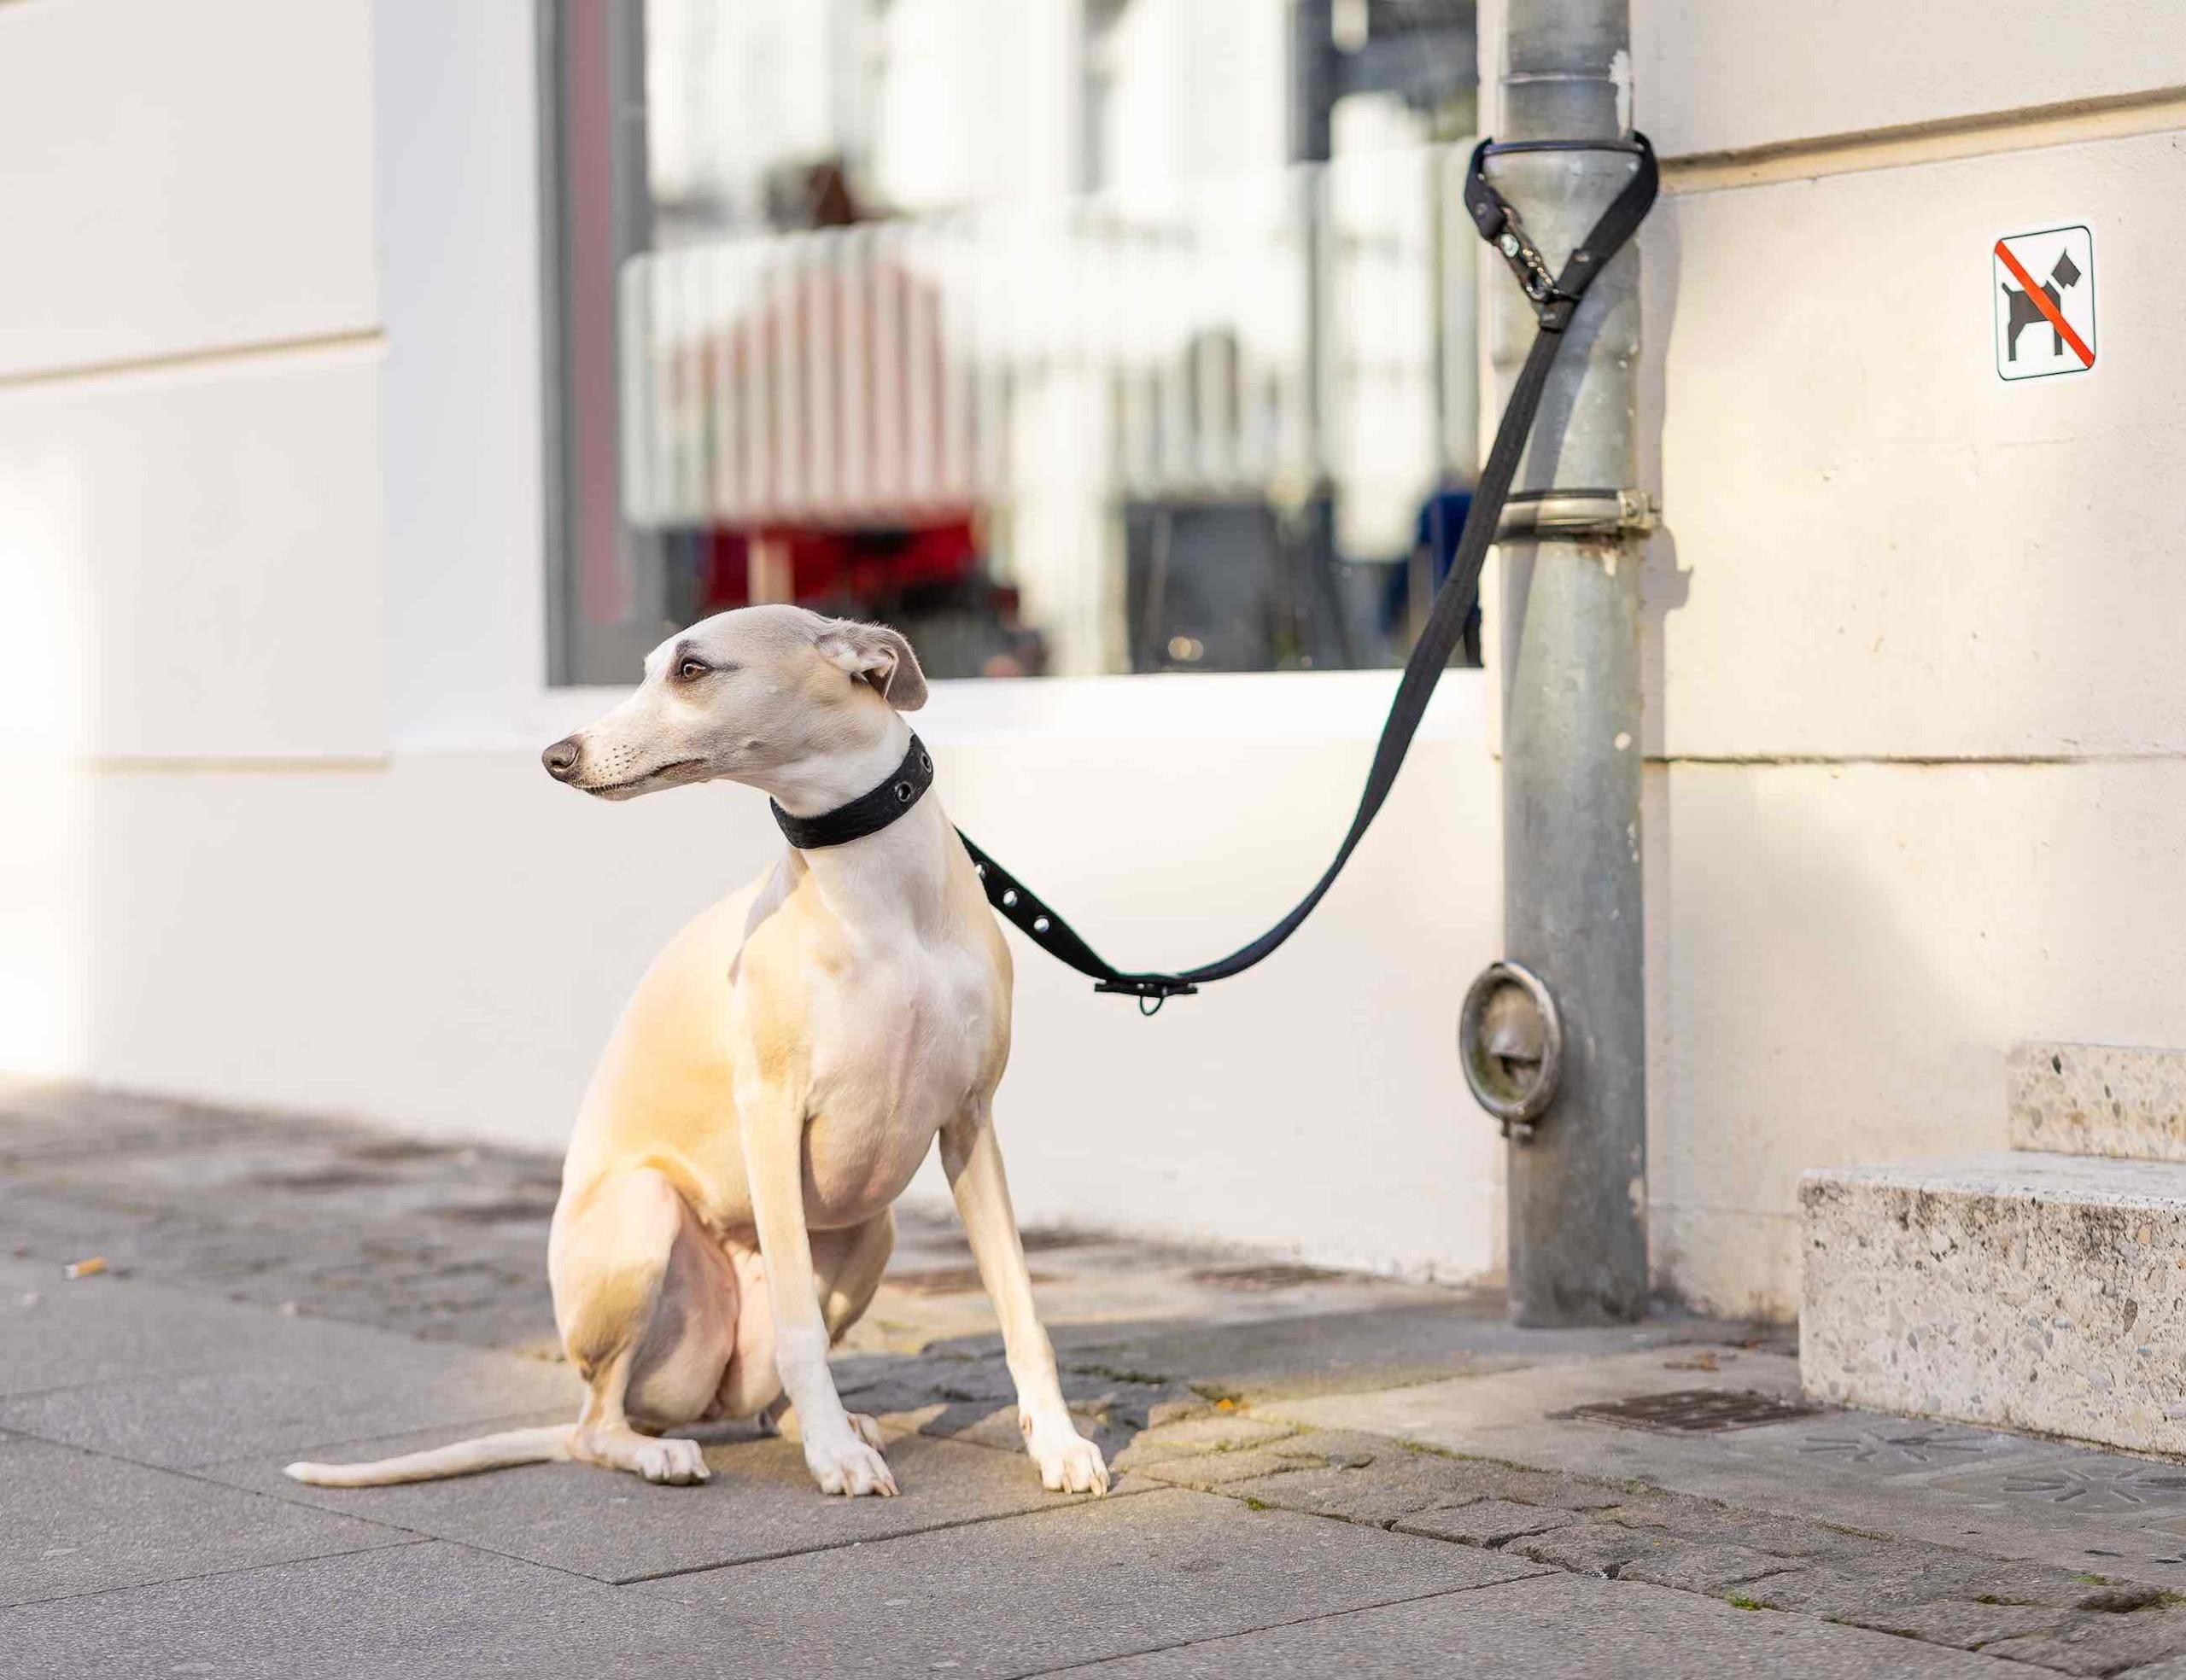 LOCK DOG Theft-proof Locking Dog Leash features two locks